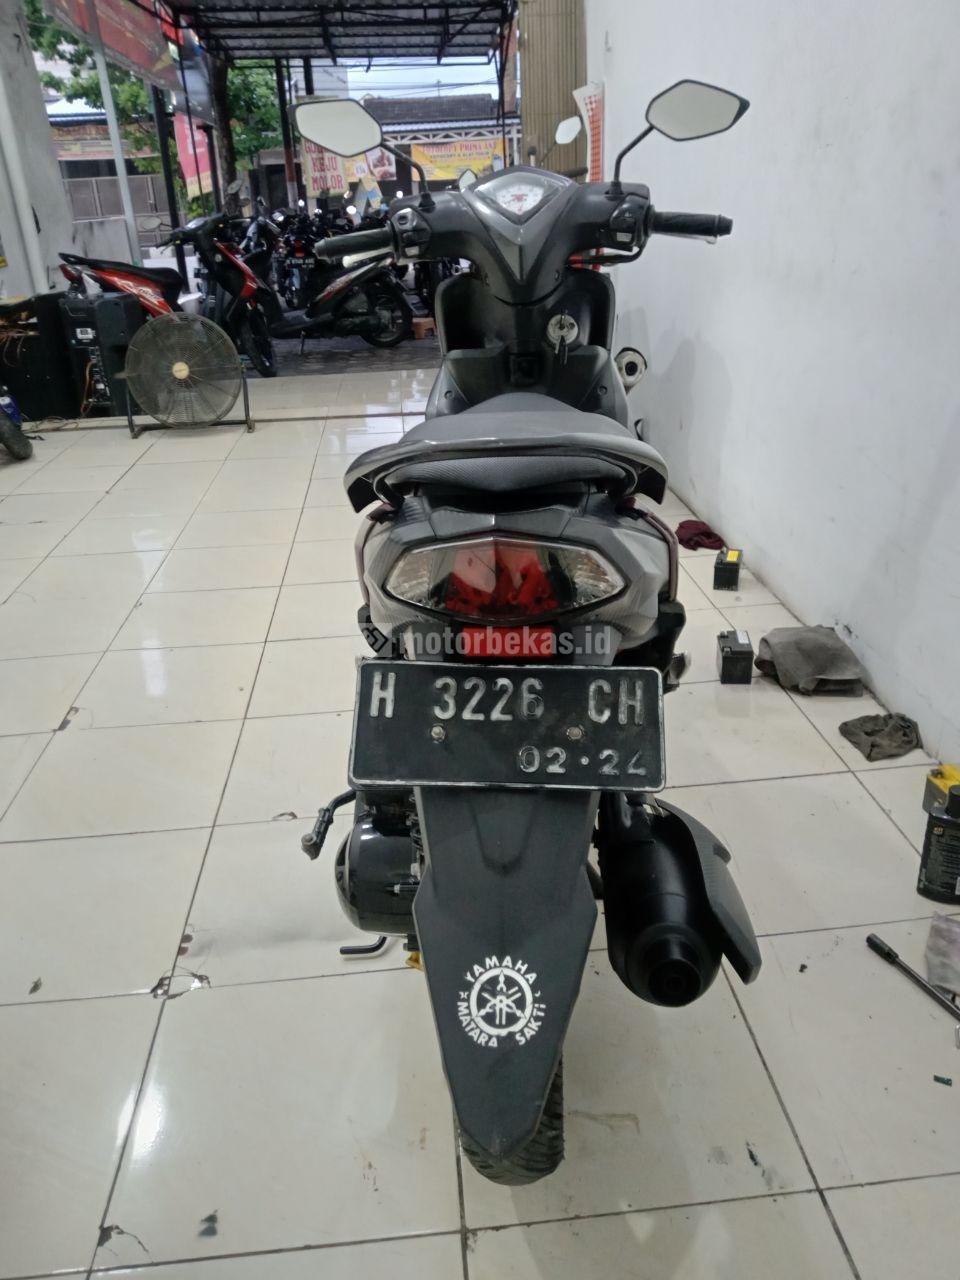 YAMAHA MIO S  2872 motorbekas.id